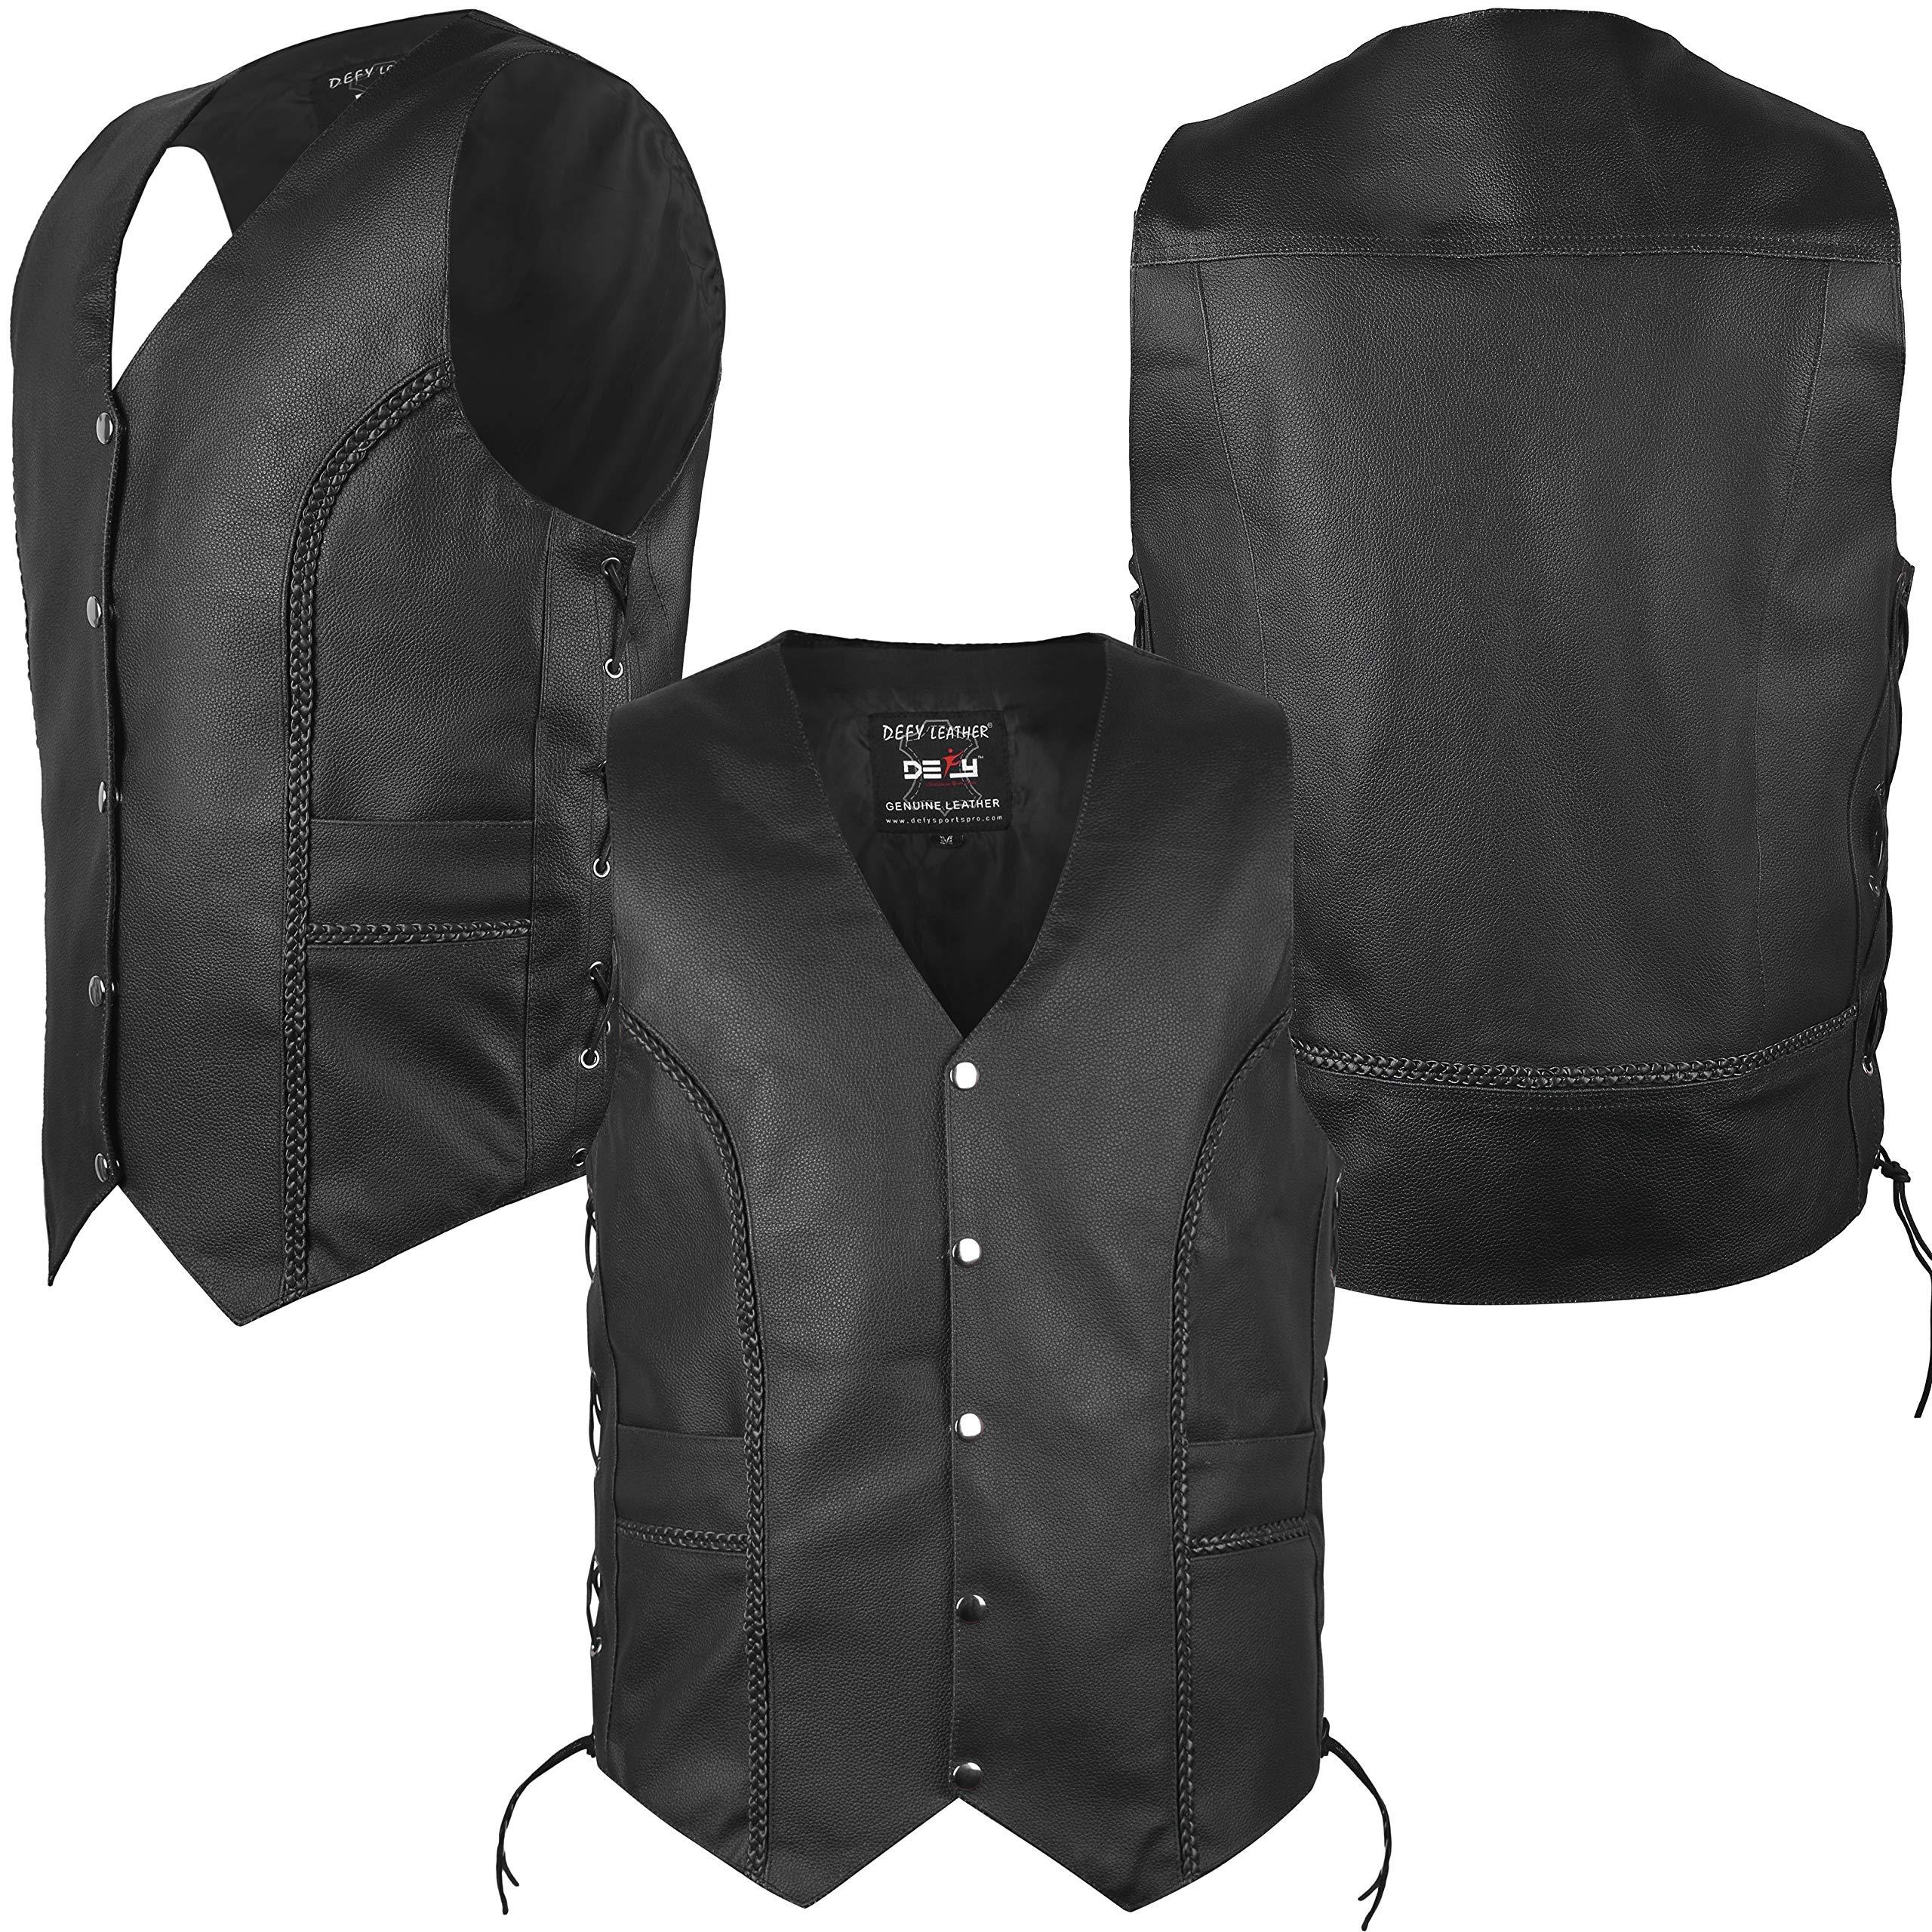 Men's Motorcycle Leather Vest Cowhide Leather Biker Vest Side Laces Inside Pockets Braided (2XL)